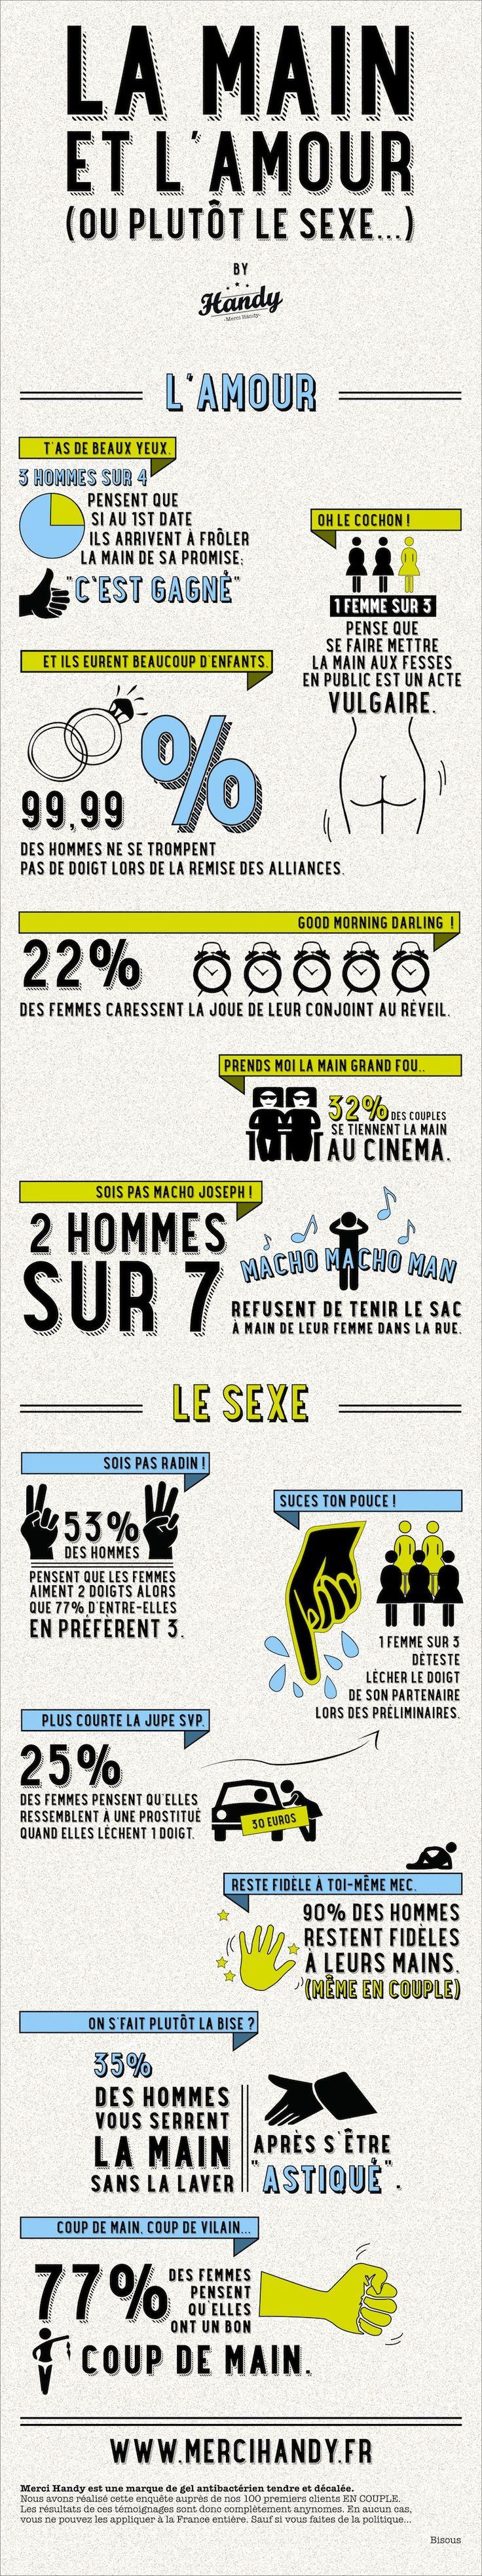 www.mercihandy.fr #infographie #art #dessins #amour #love #sexe #choc #femmes #couples #hommes